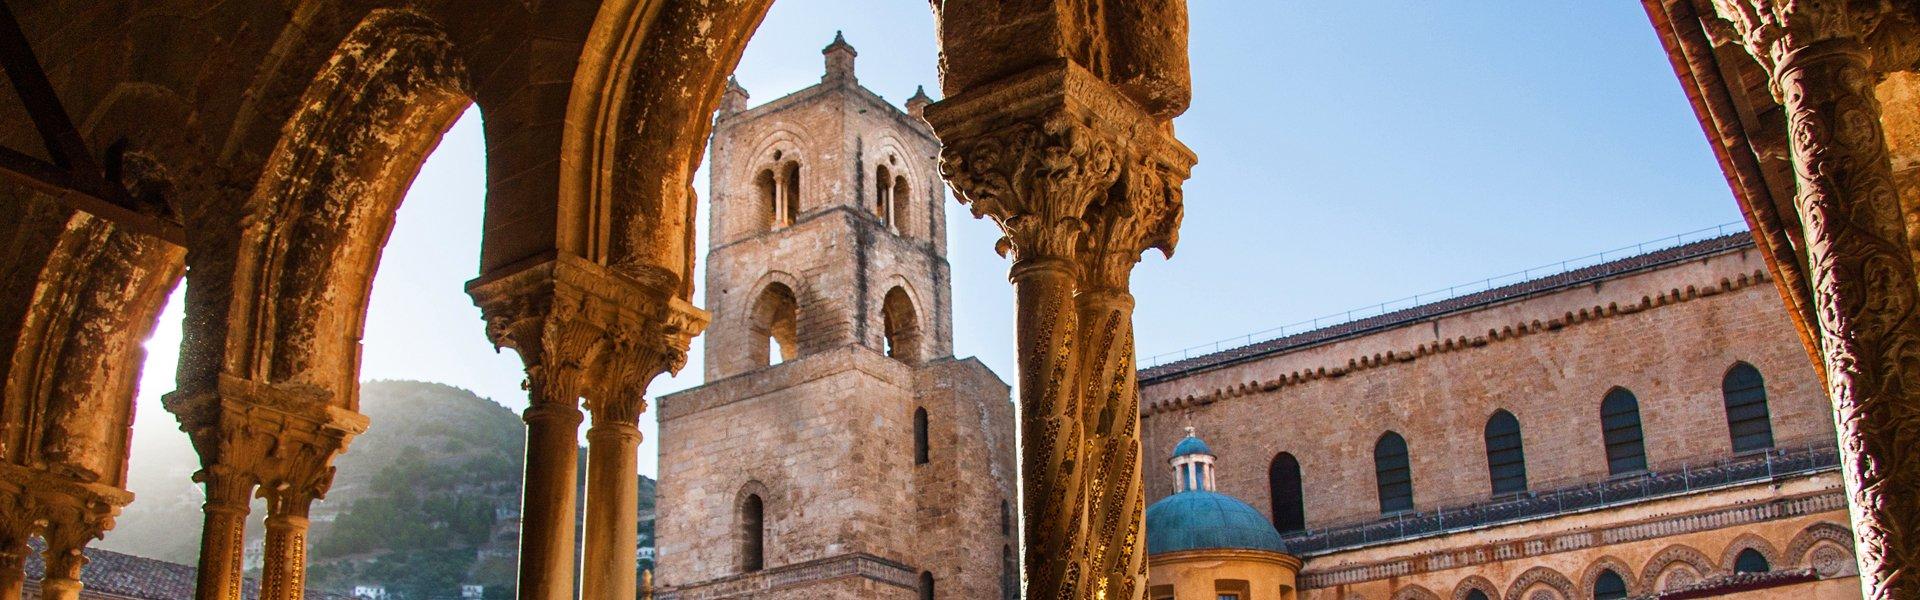 Monreale op Sicilië, Italië